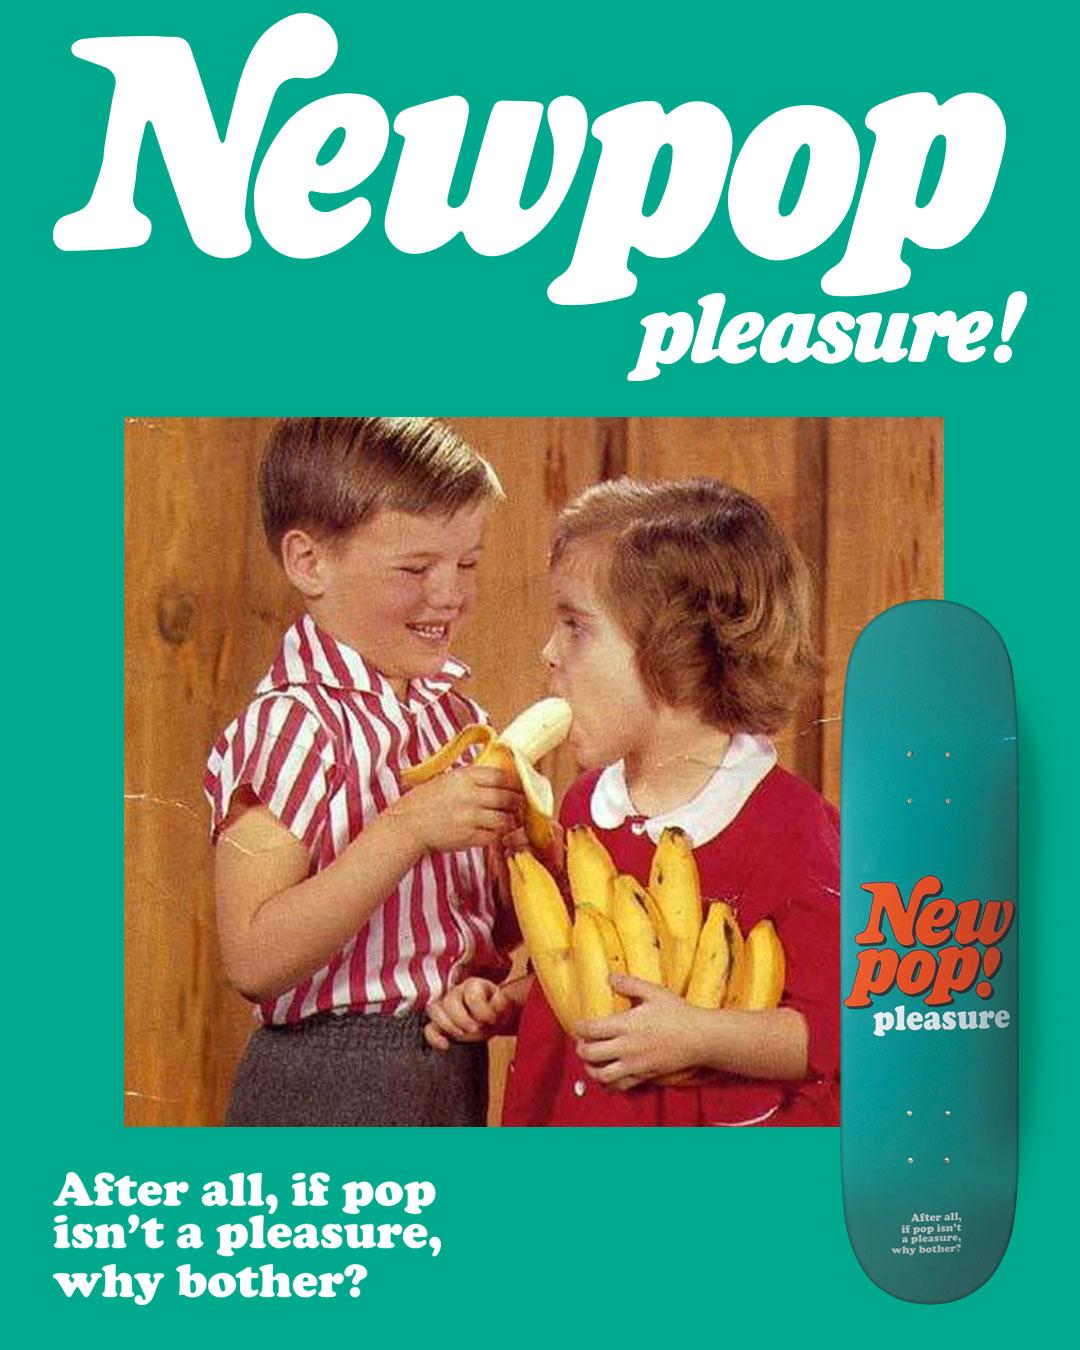 newpop_pleasure_ad_web.jpg